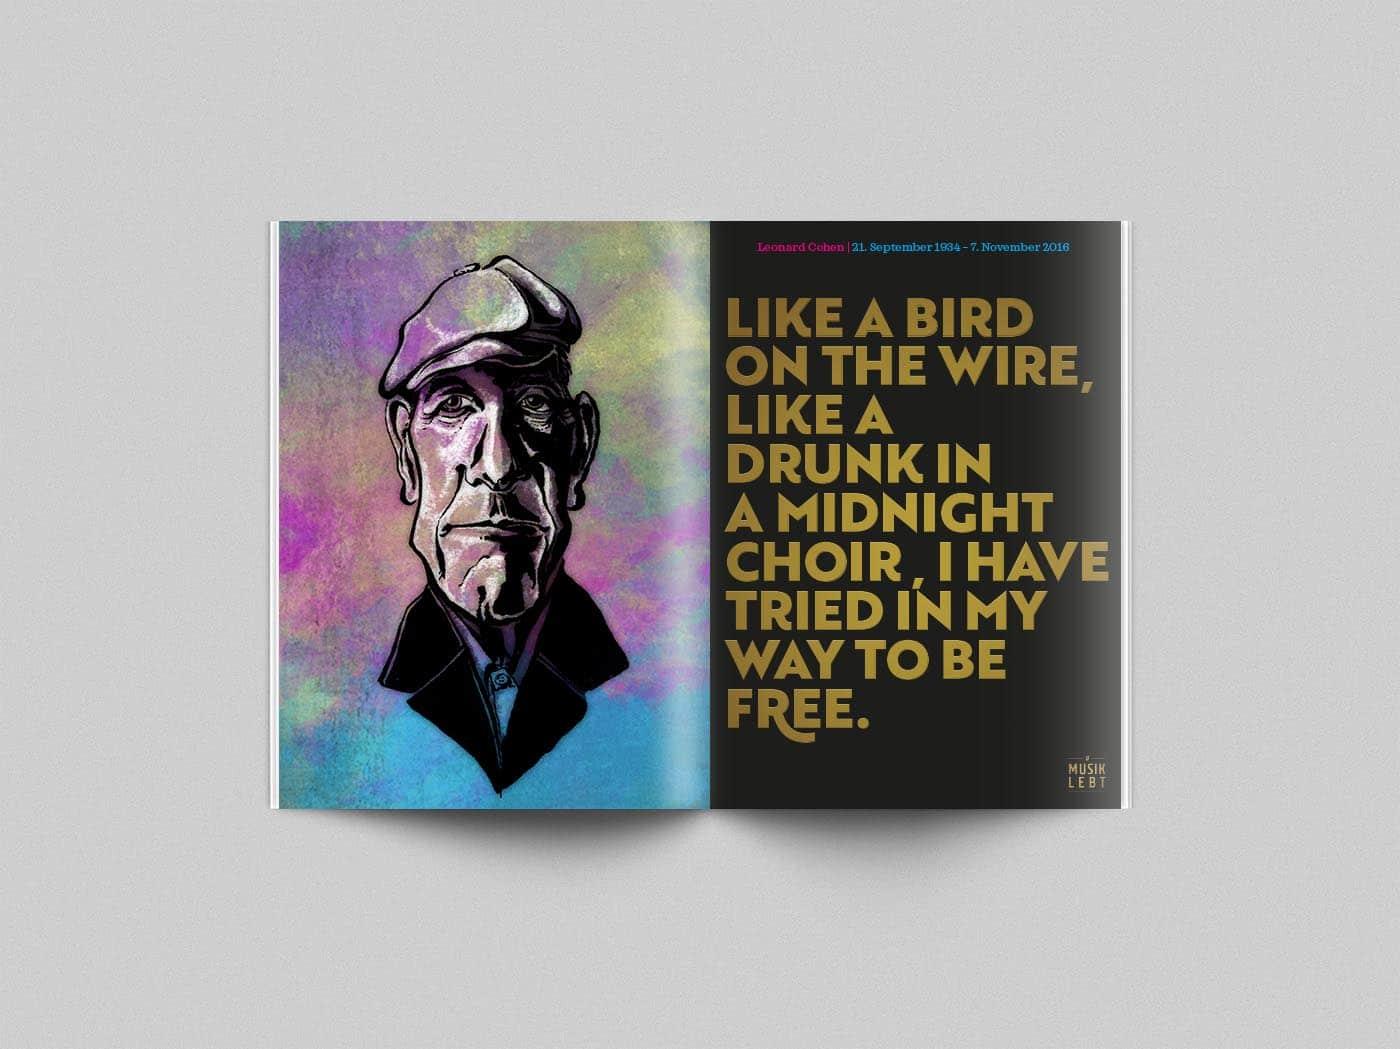 Musik lebt – Leonard Cohen